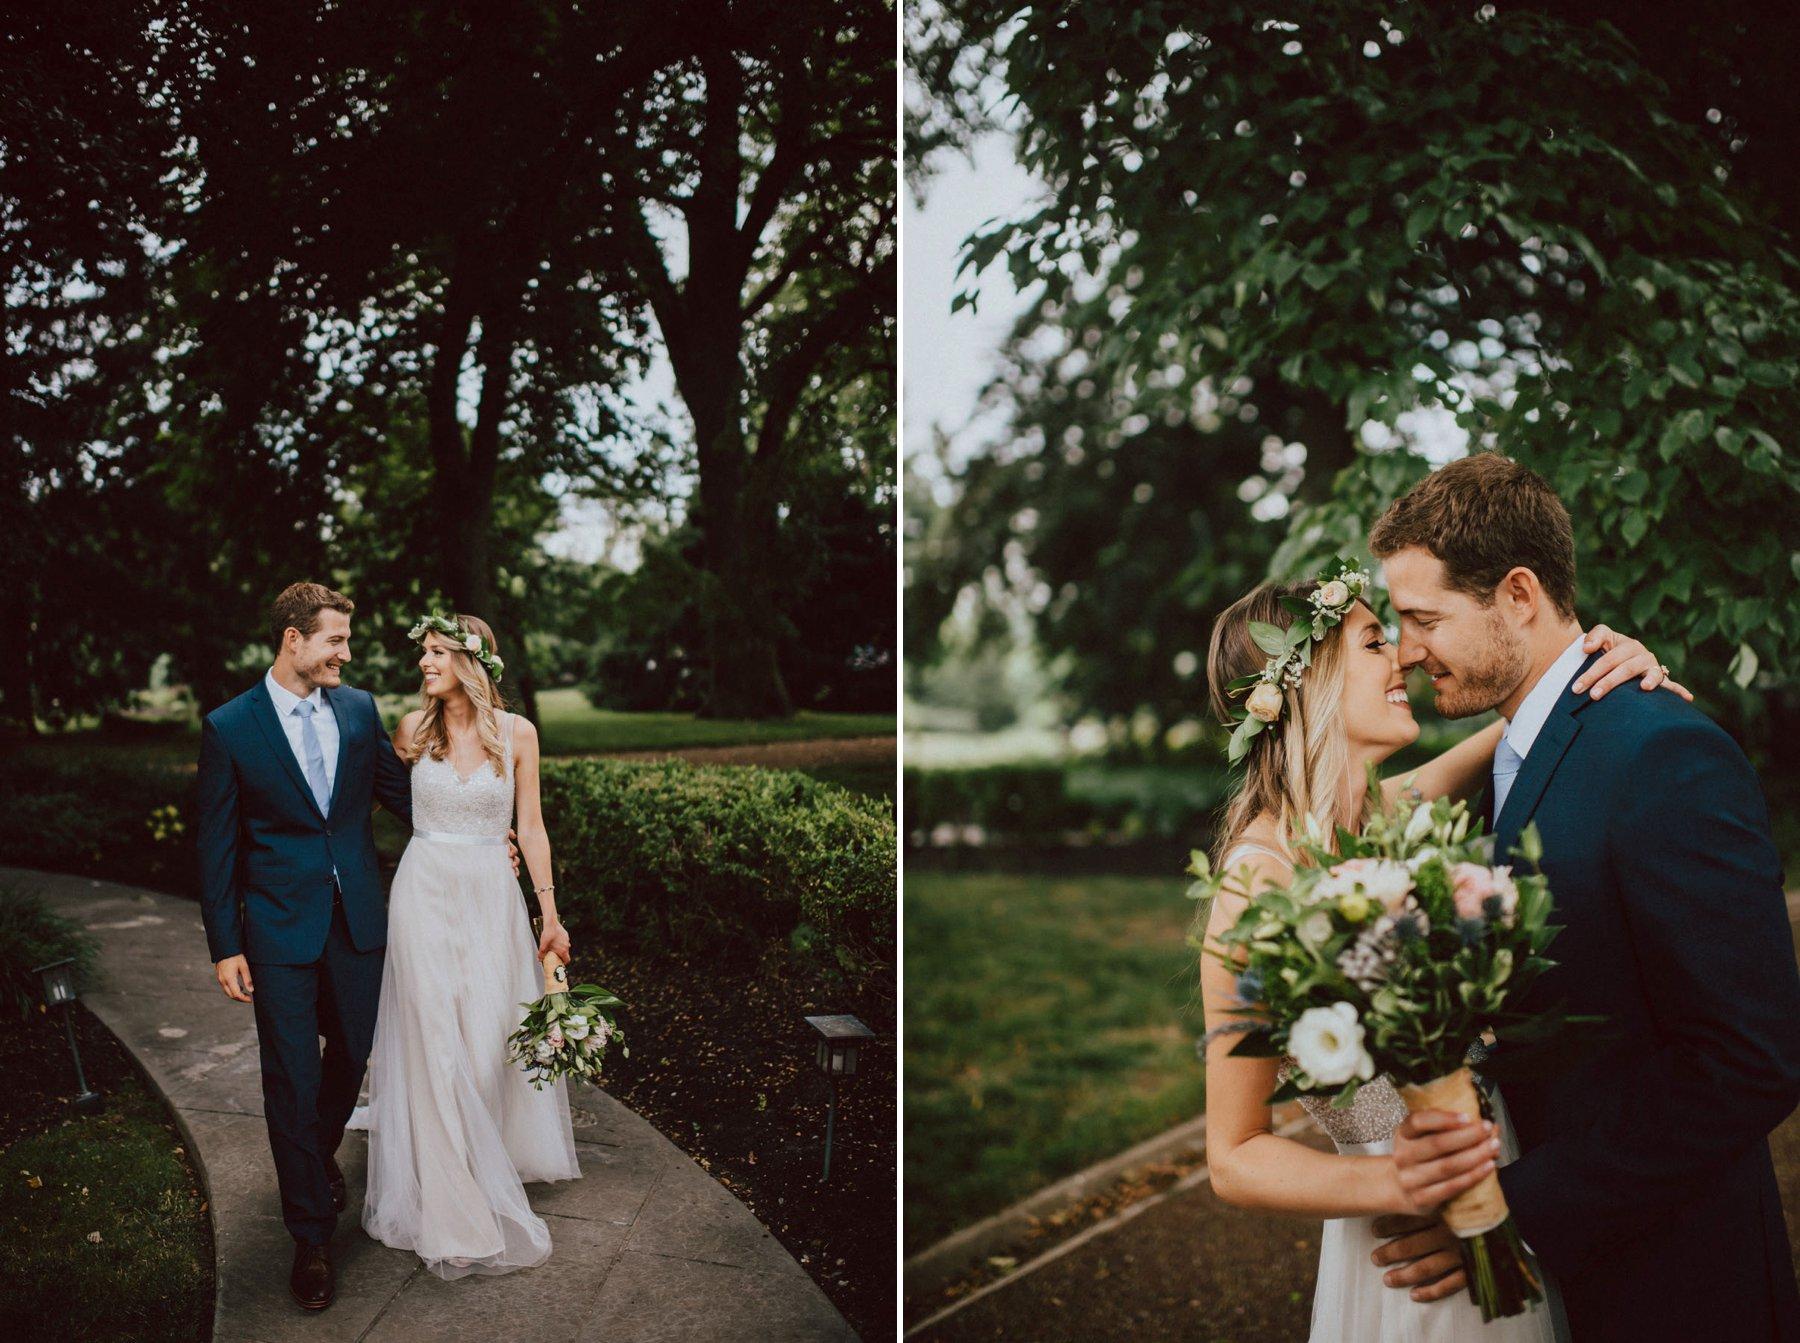 Knowlton-mansion-wedding-55.jpg